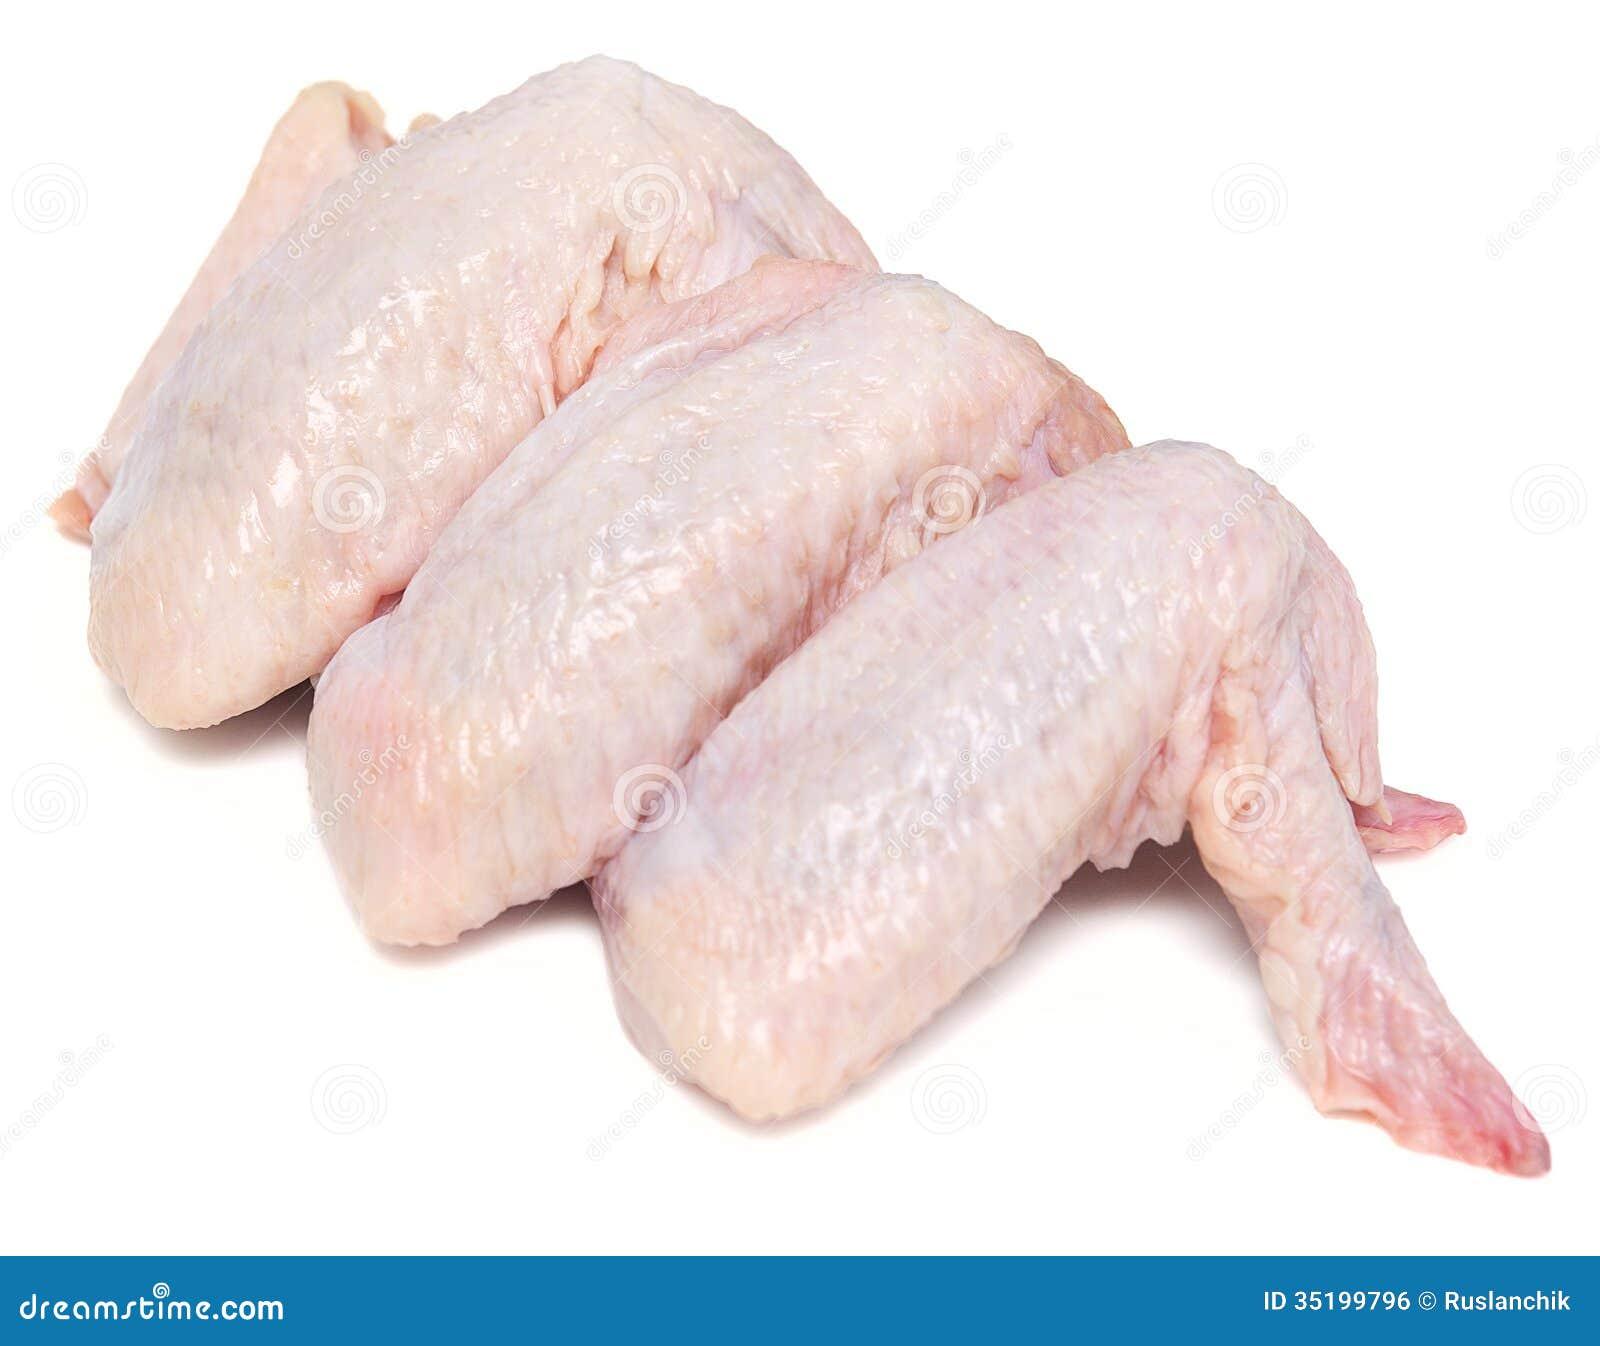 Undercooked Chicken Wi... Undercooked Chicken Wings